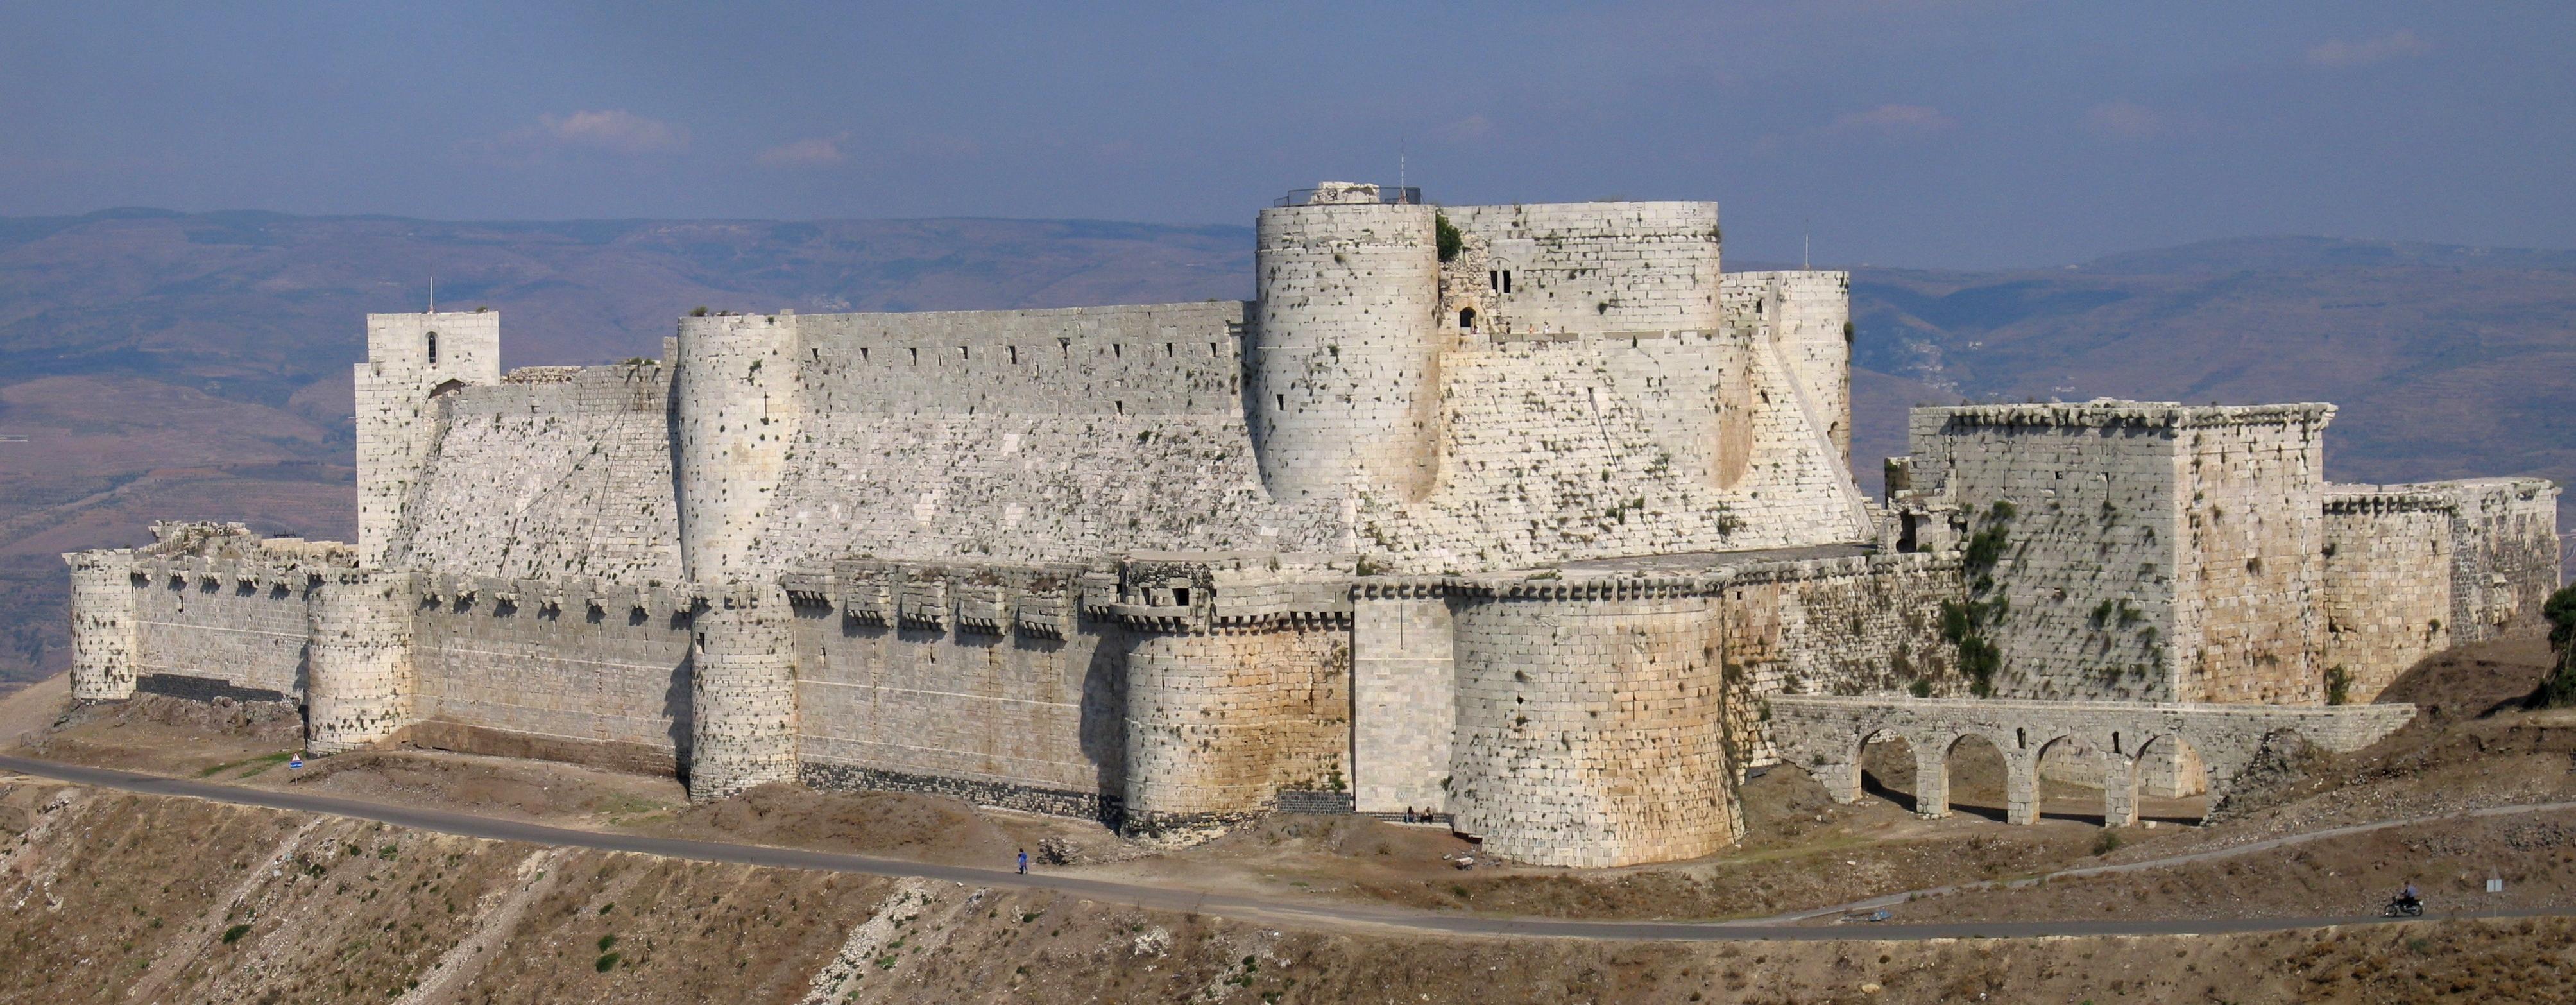 https://i0.wp.com/upload.wikimedia.org/wikipedia/commons/5/5a/Crac_des_chevaliers_syria.jpeg